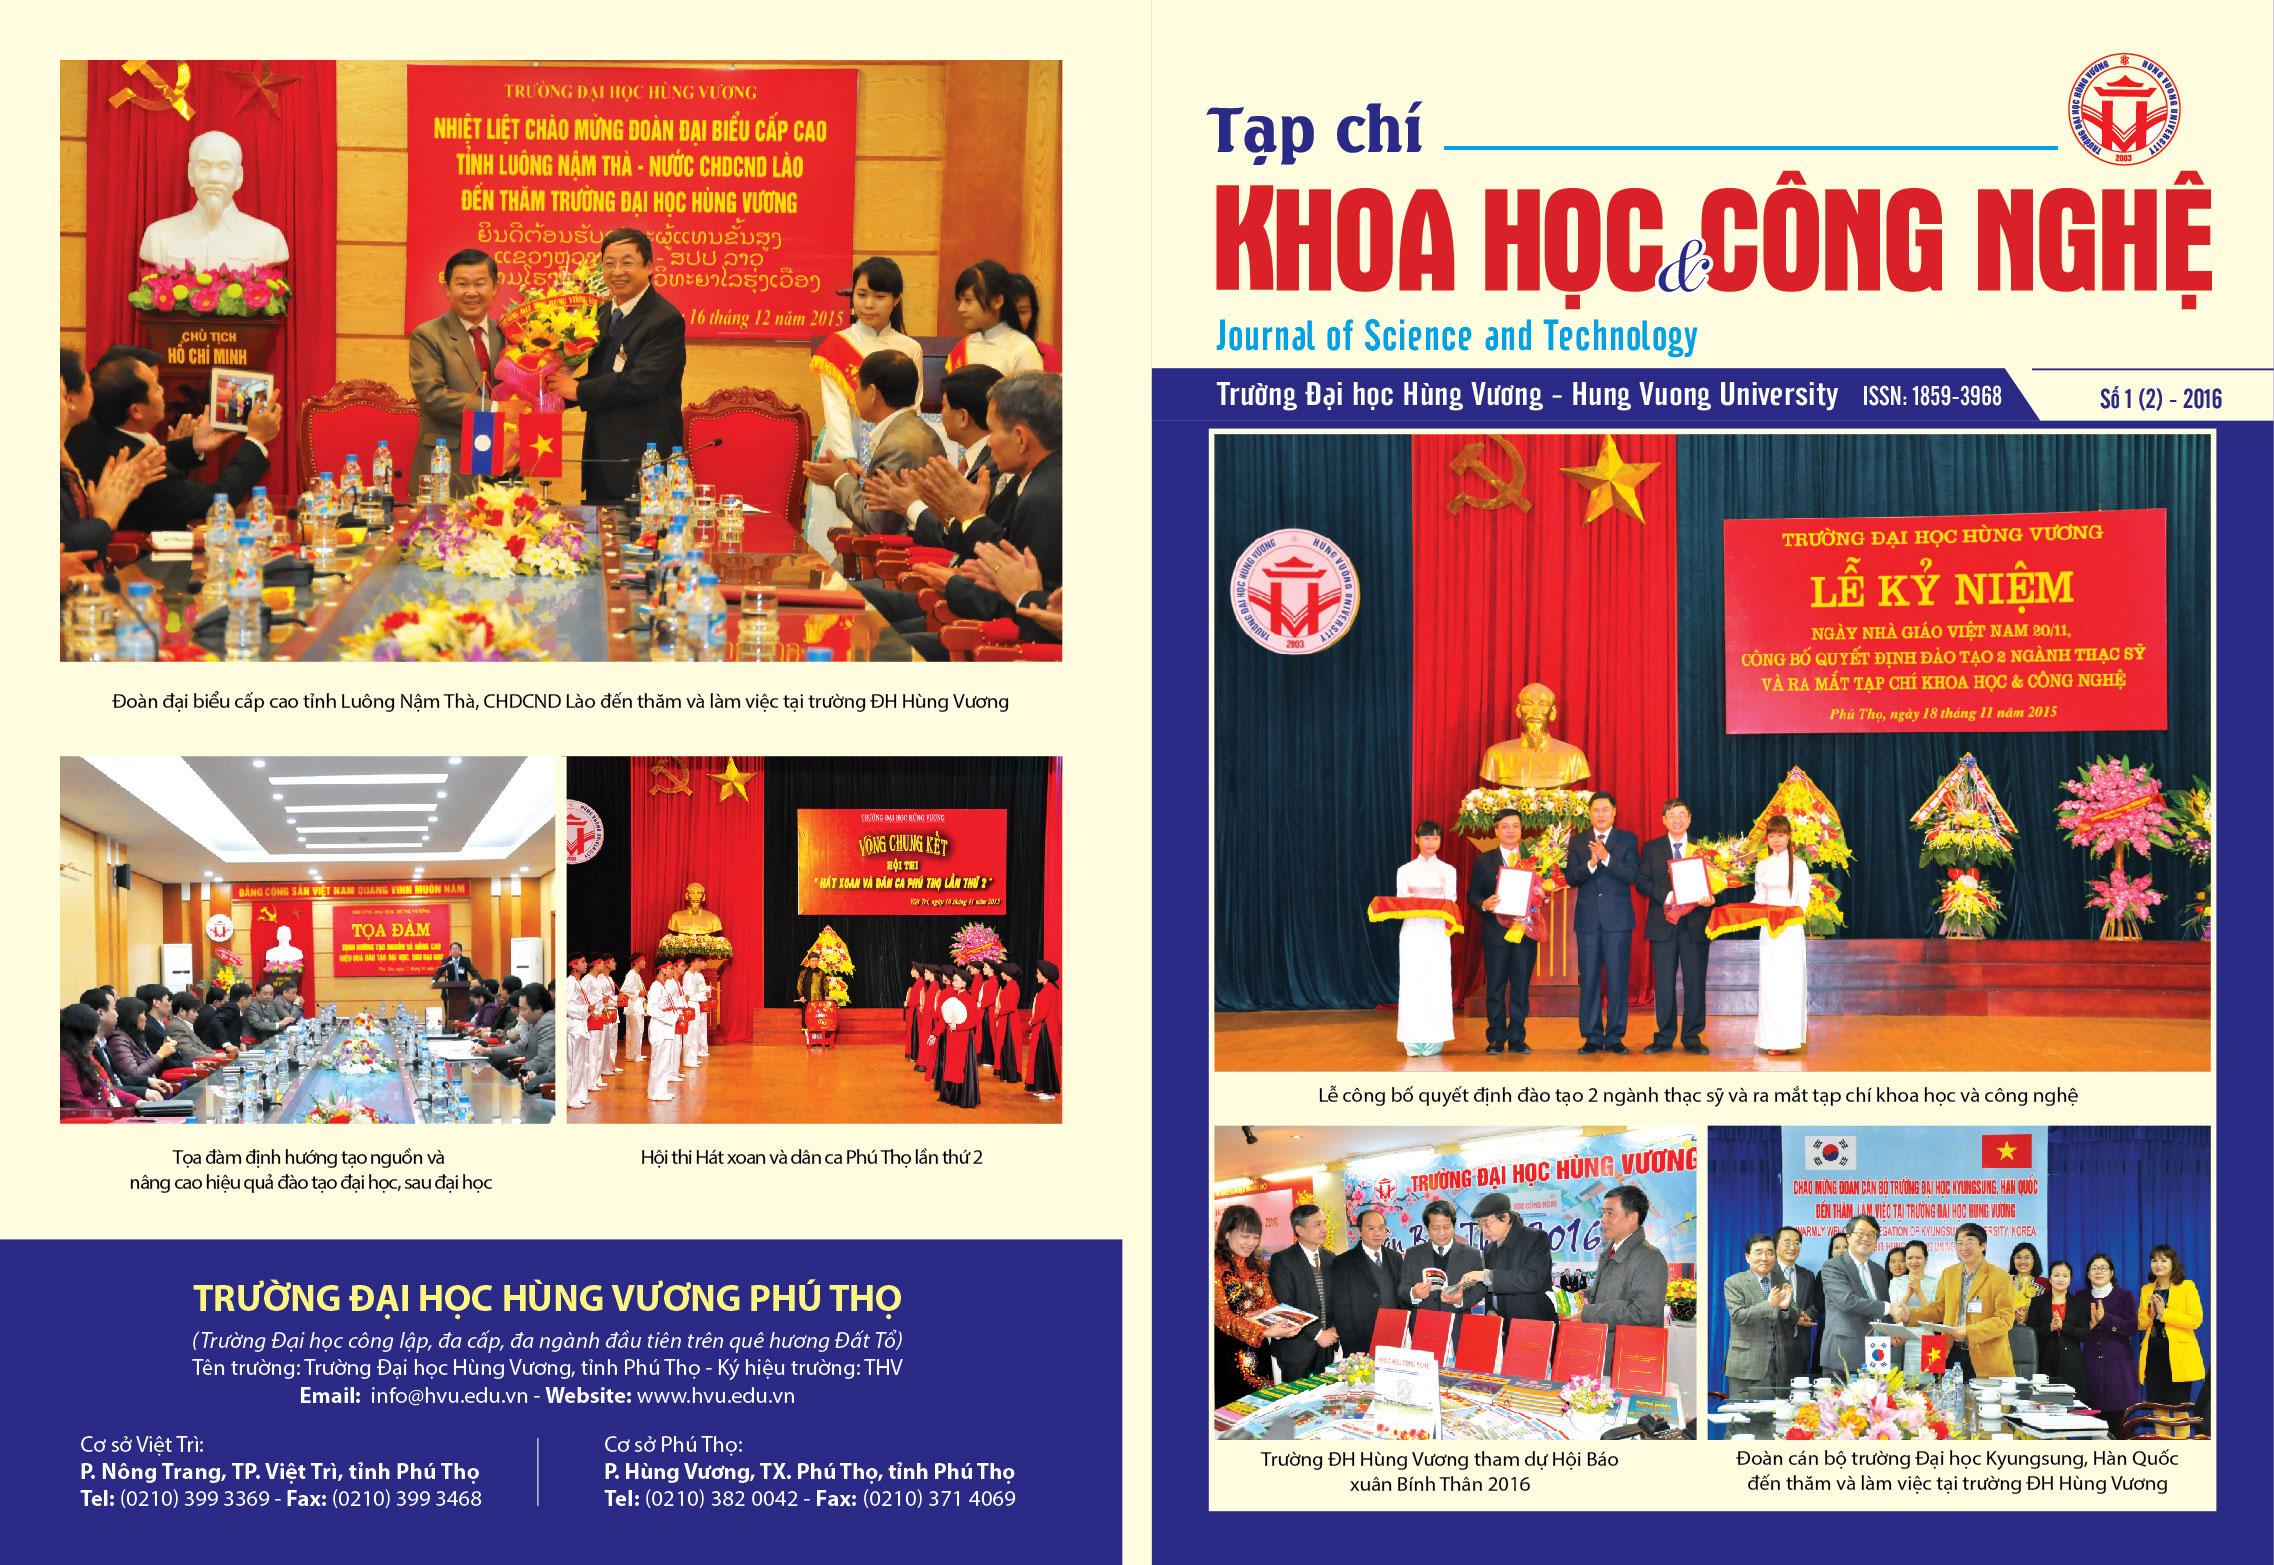 Tap chi Khoa hoc Cong nghe so 2 - 2016